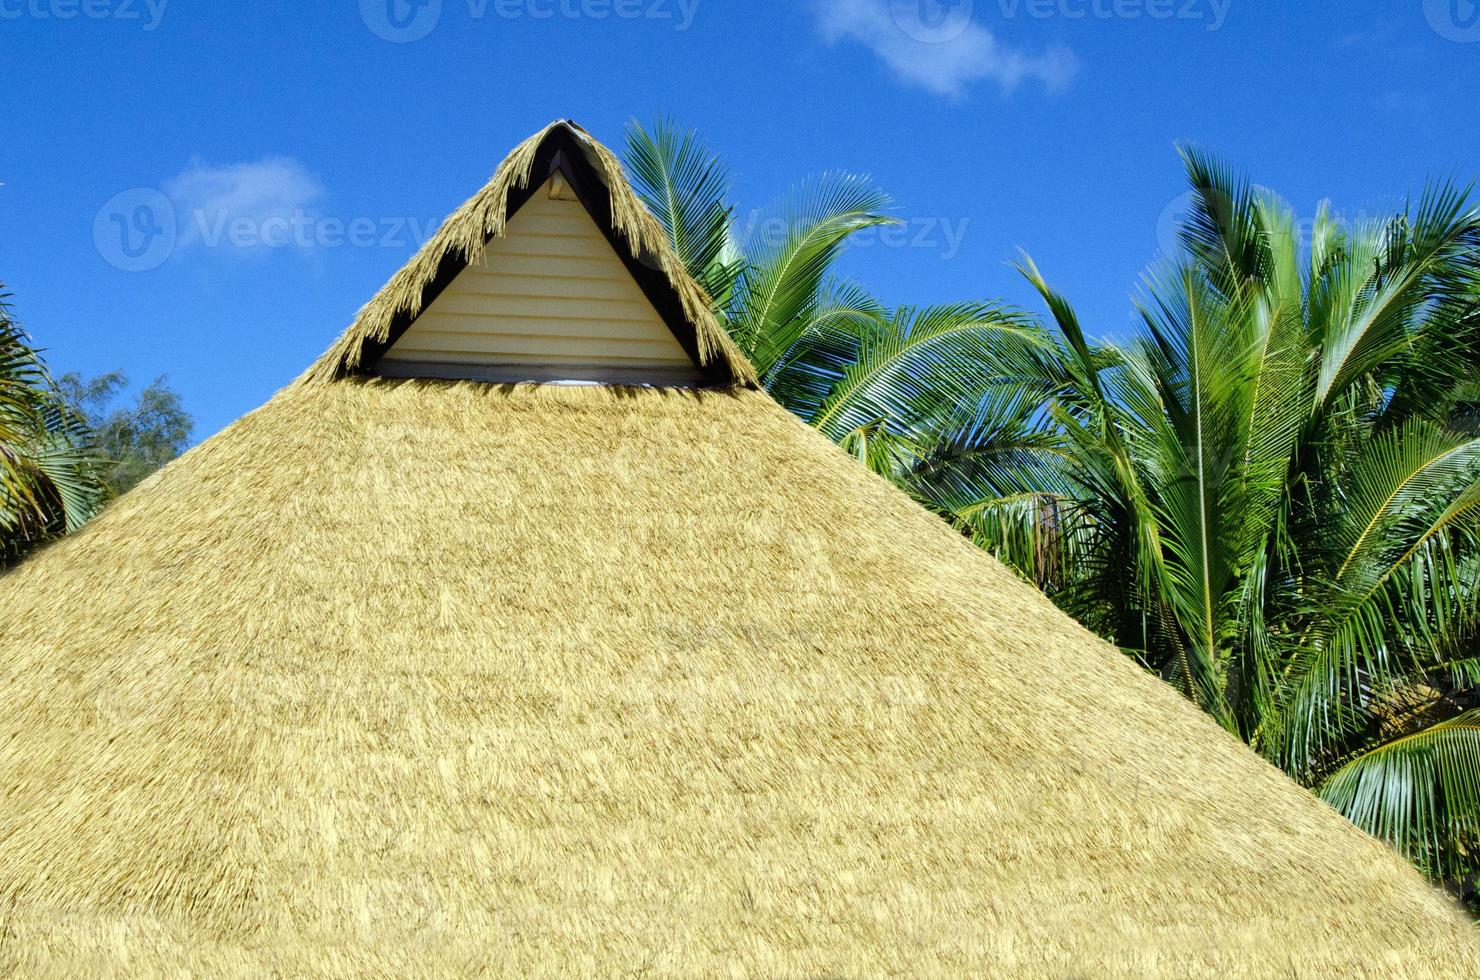 Pacific Island Hut foto